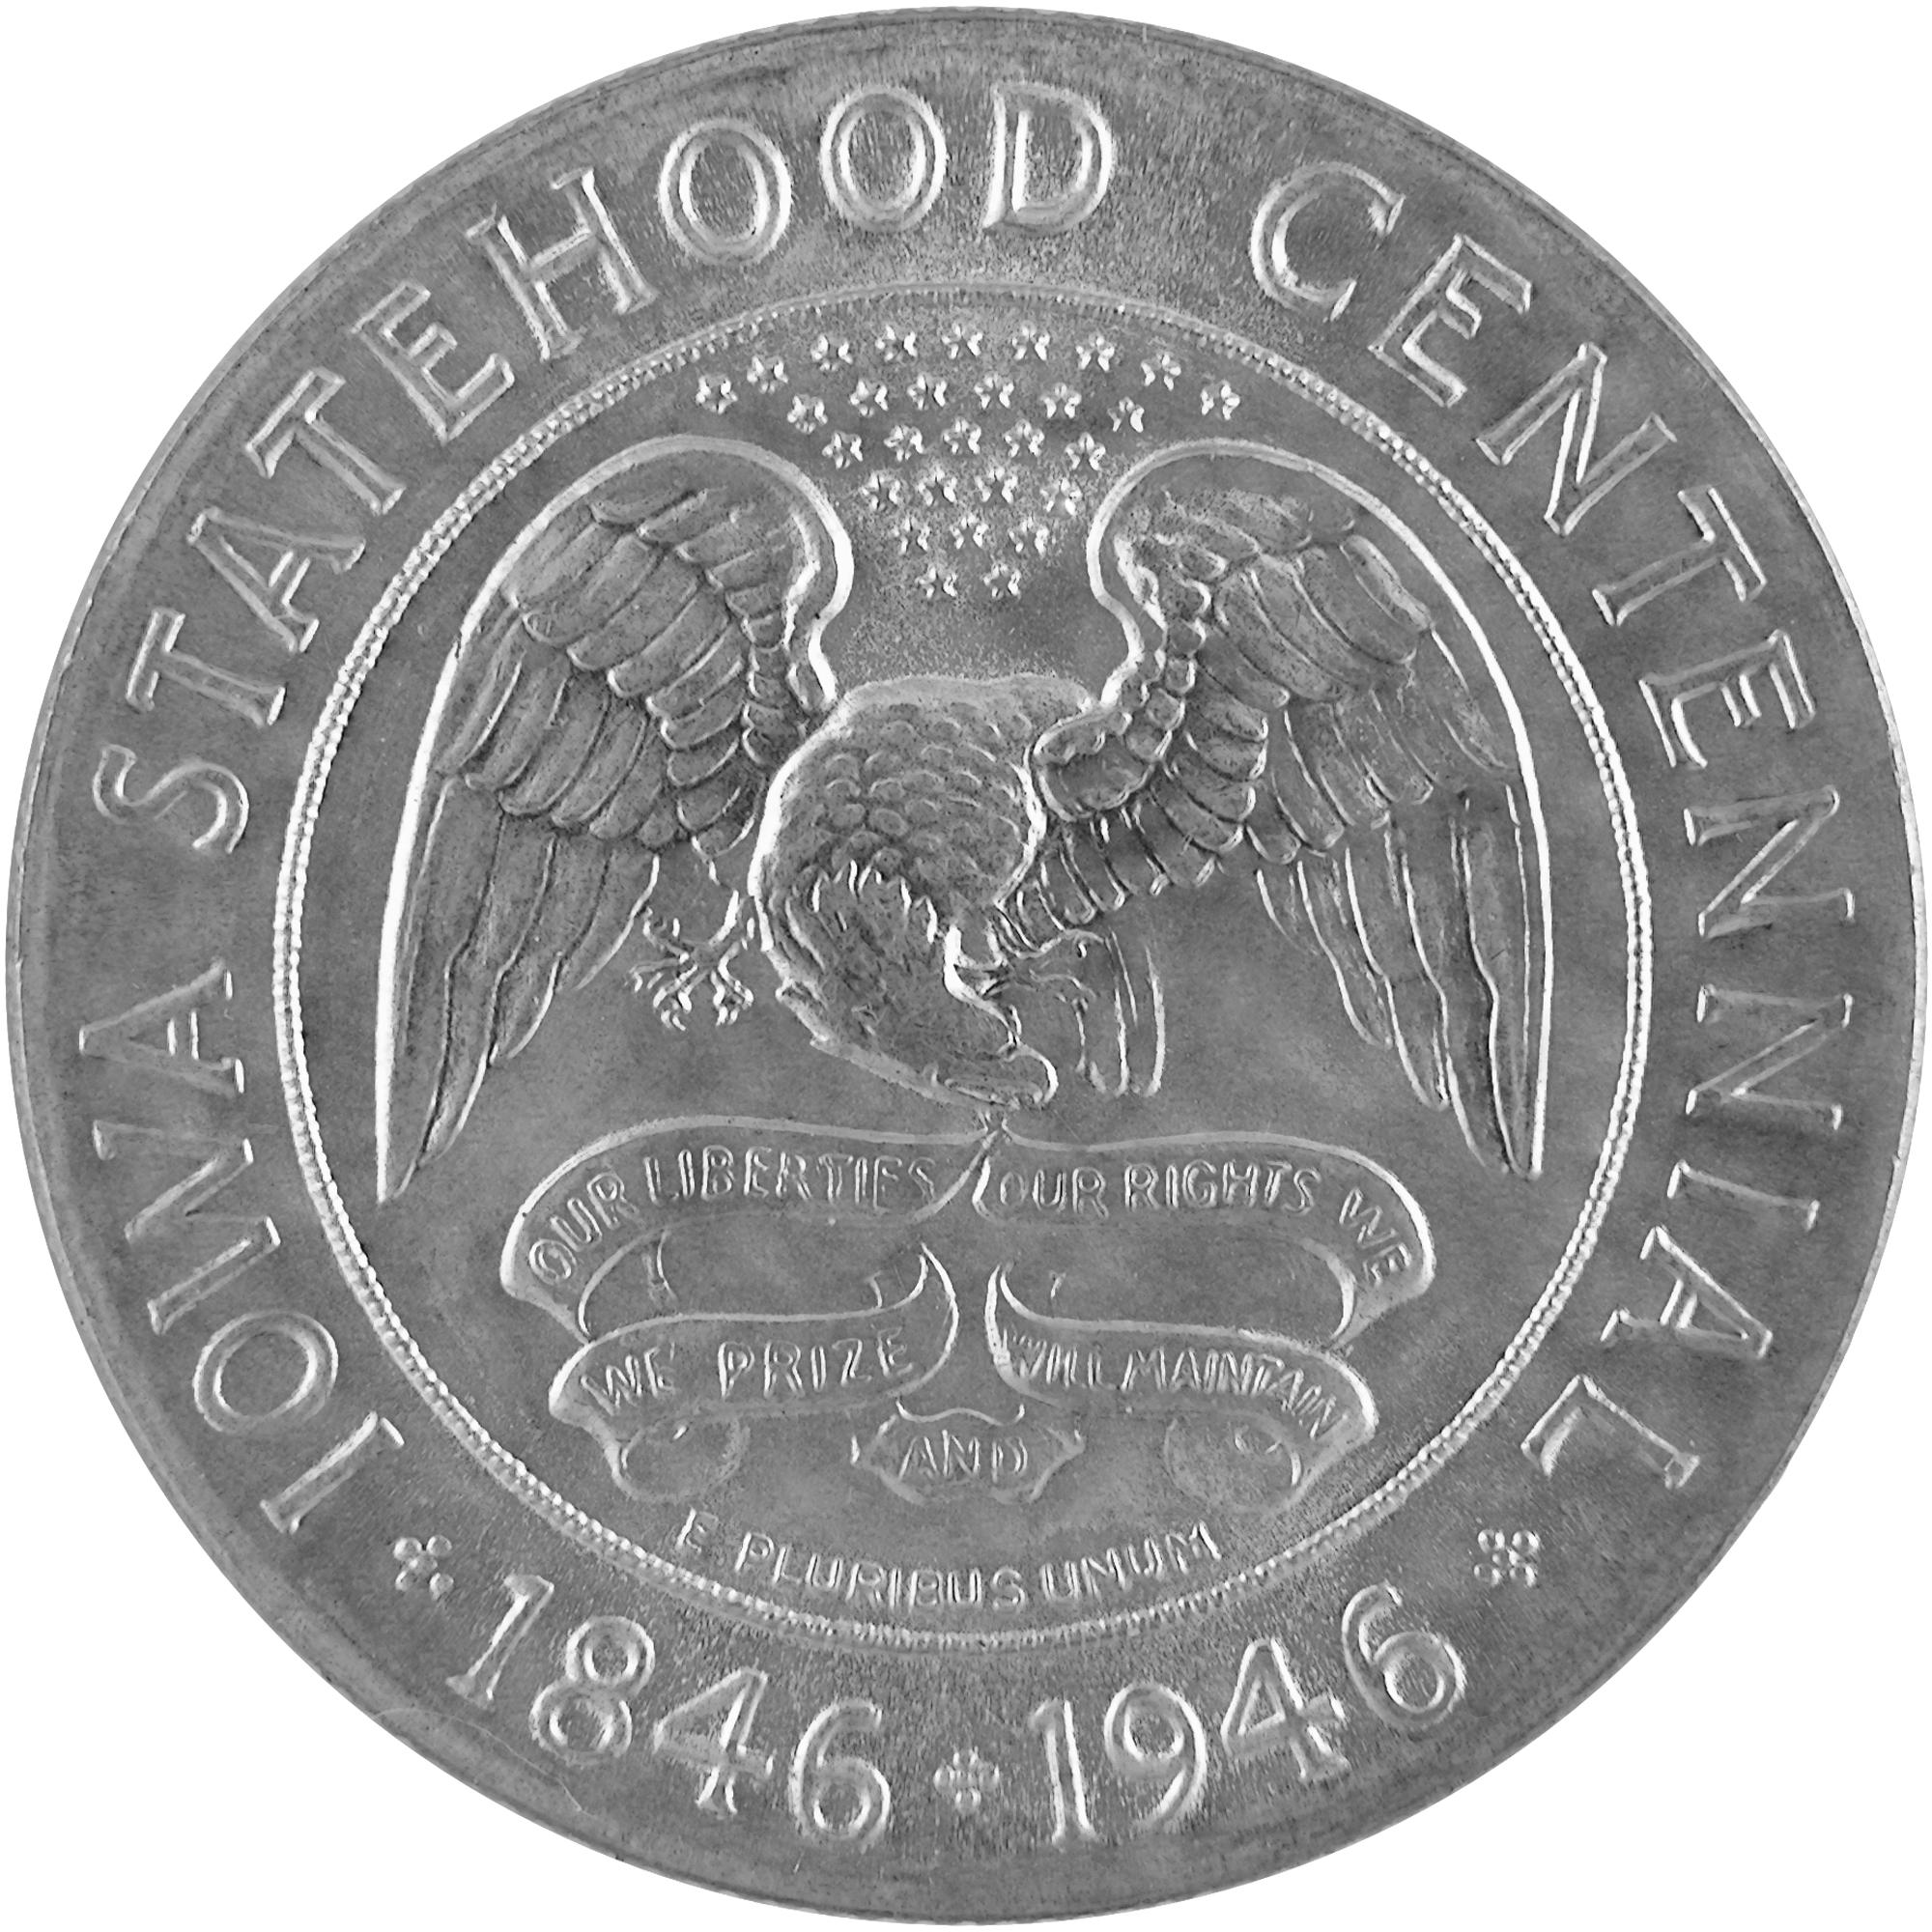 1946 Iowa Statehood Centennial Commemorative Silver Half Dollar Coin Reverse